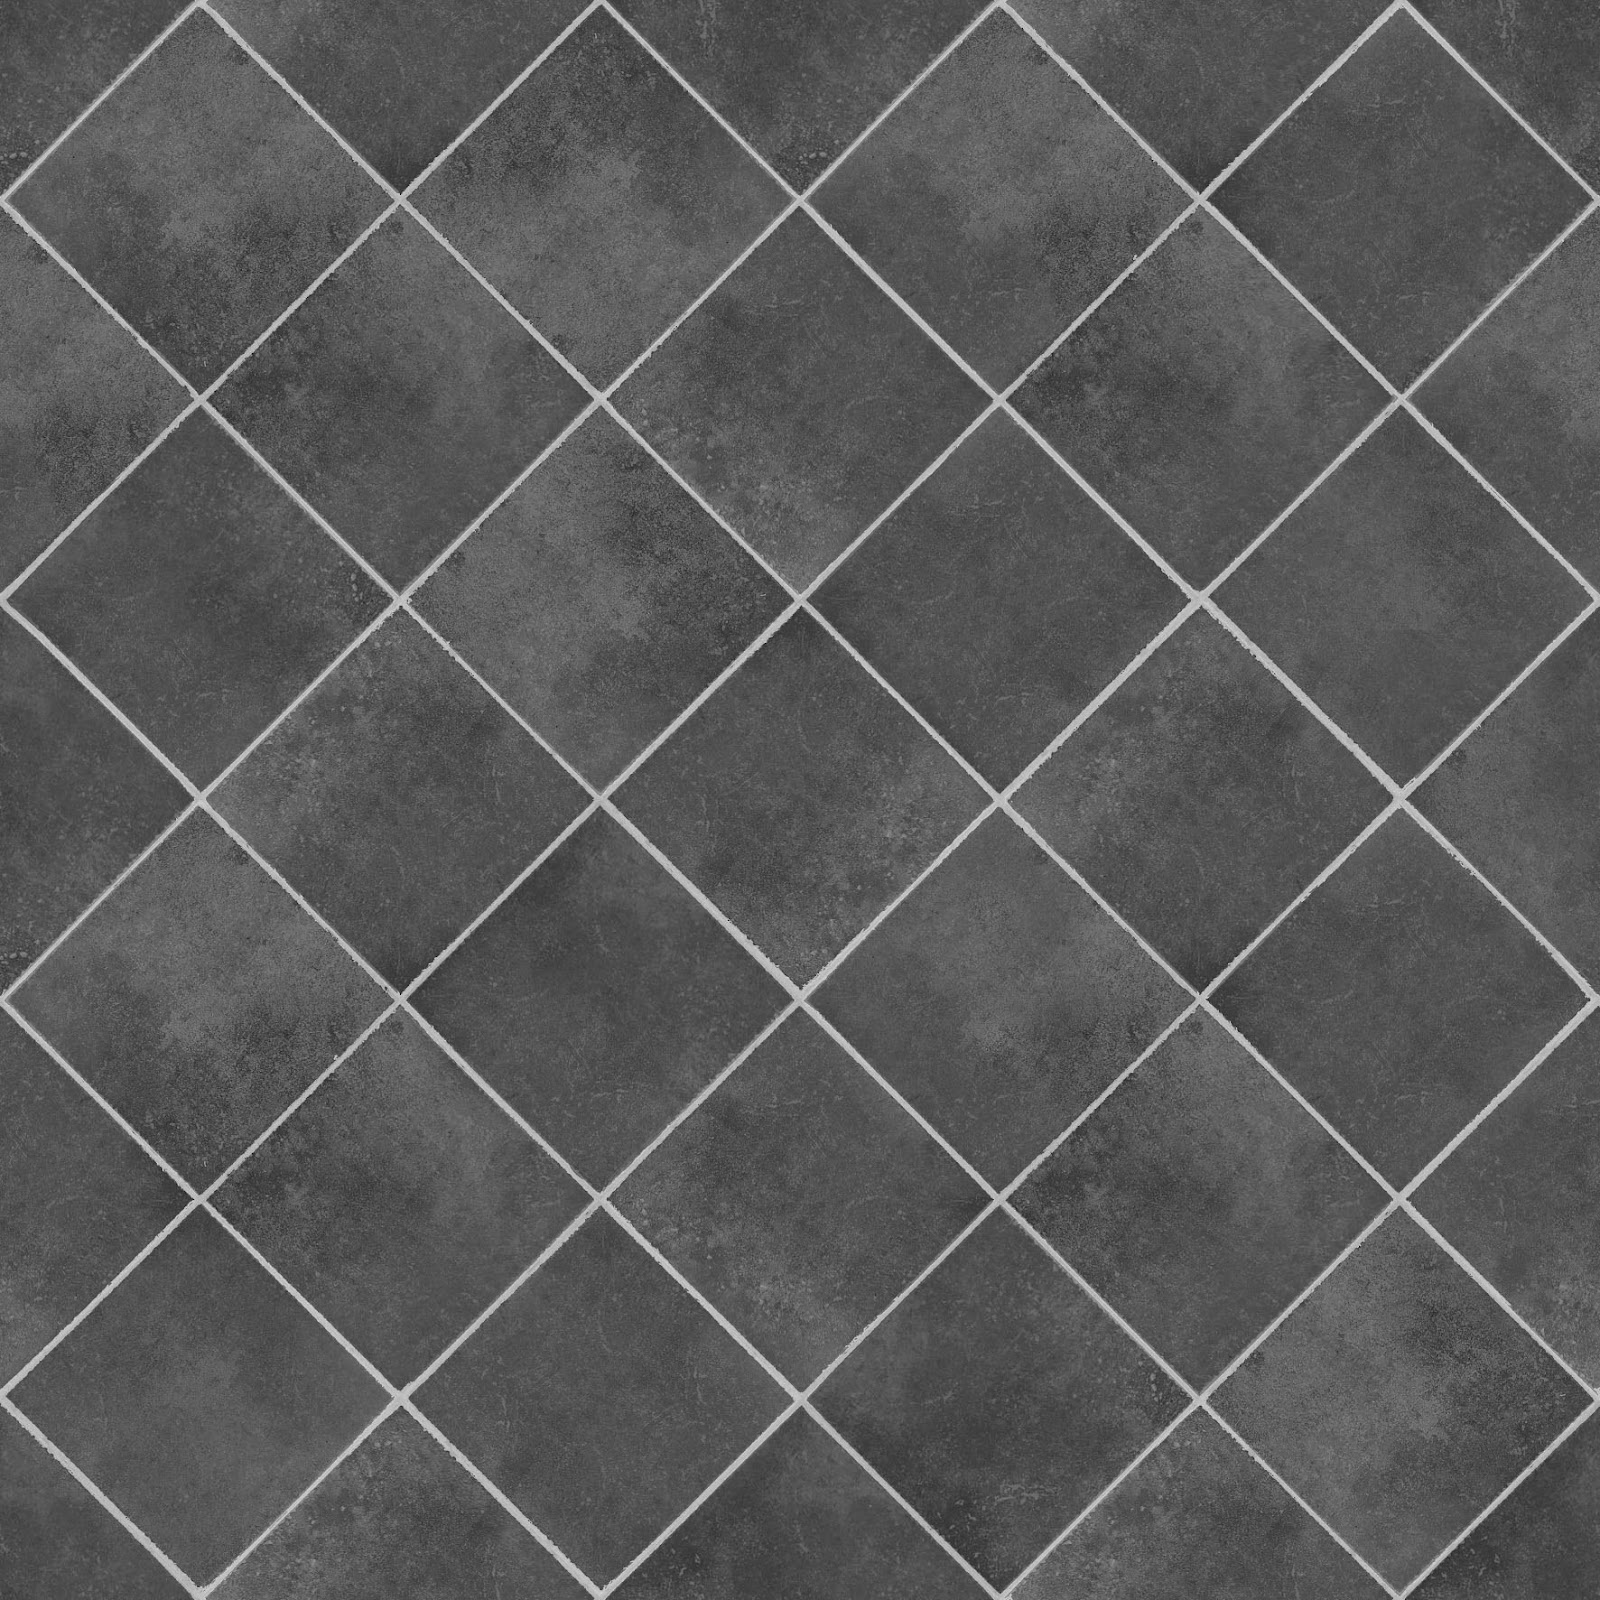 Simo 3d Blogspot Com Texture Seamless Pavimento In Cotto